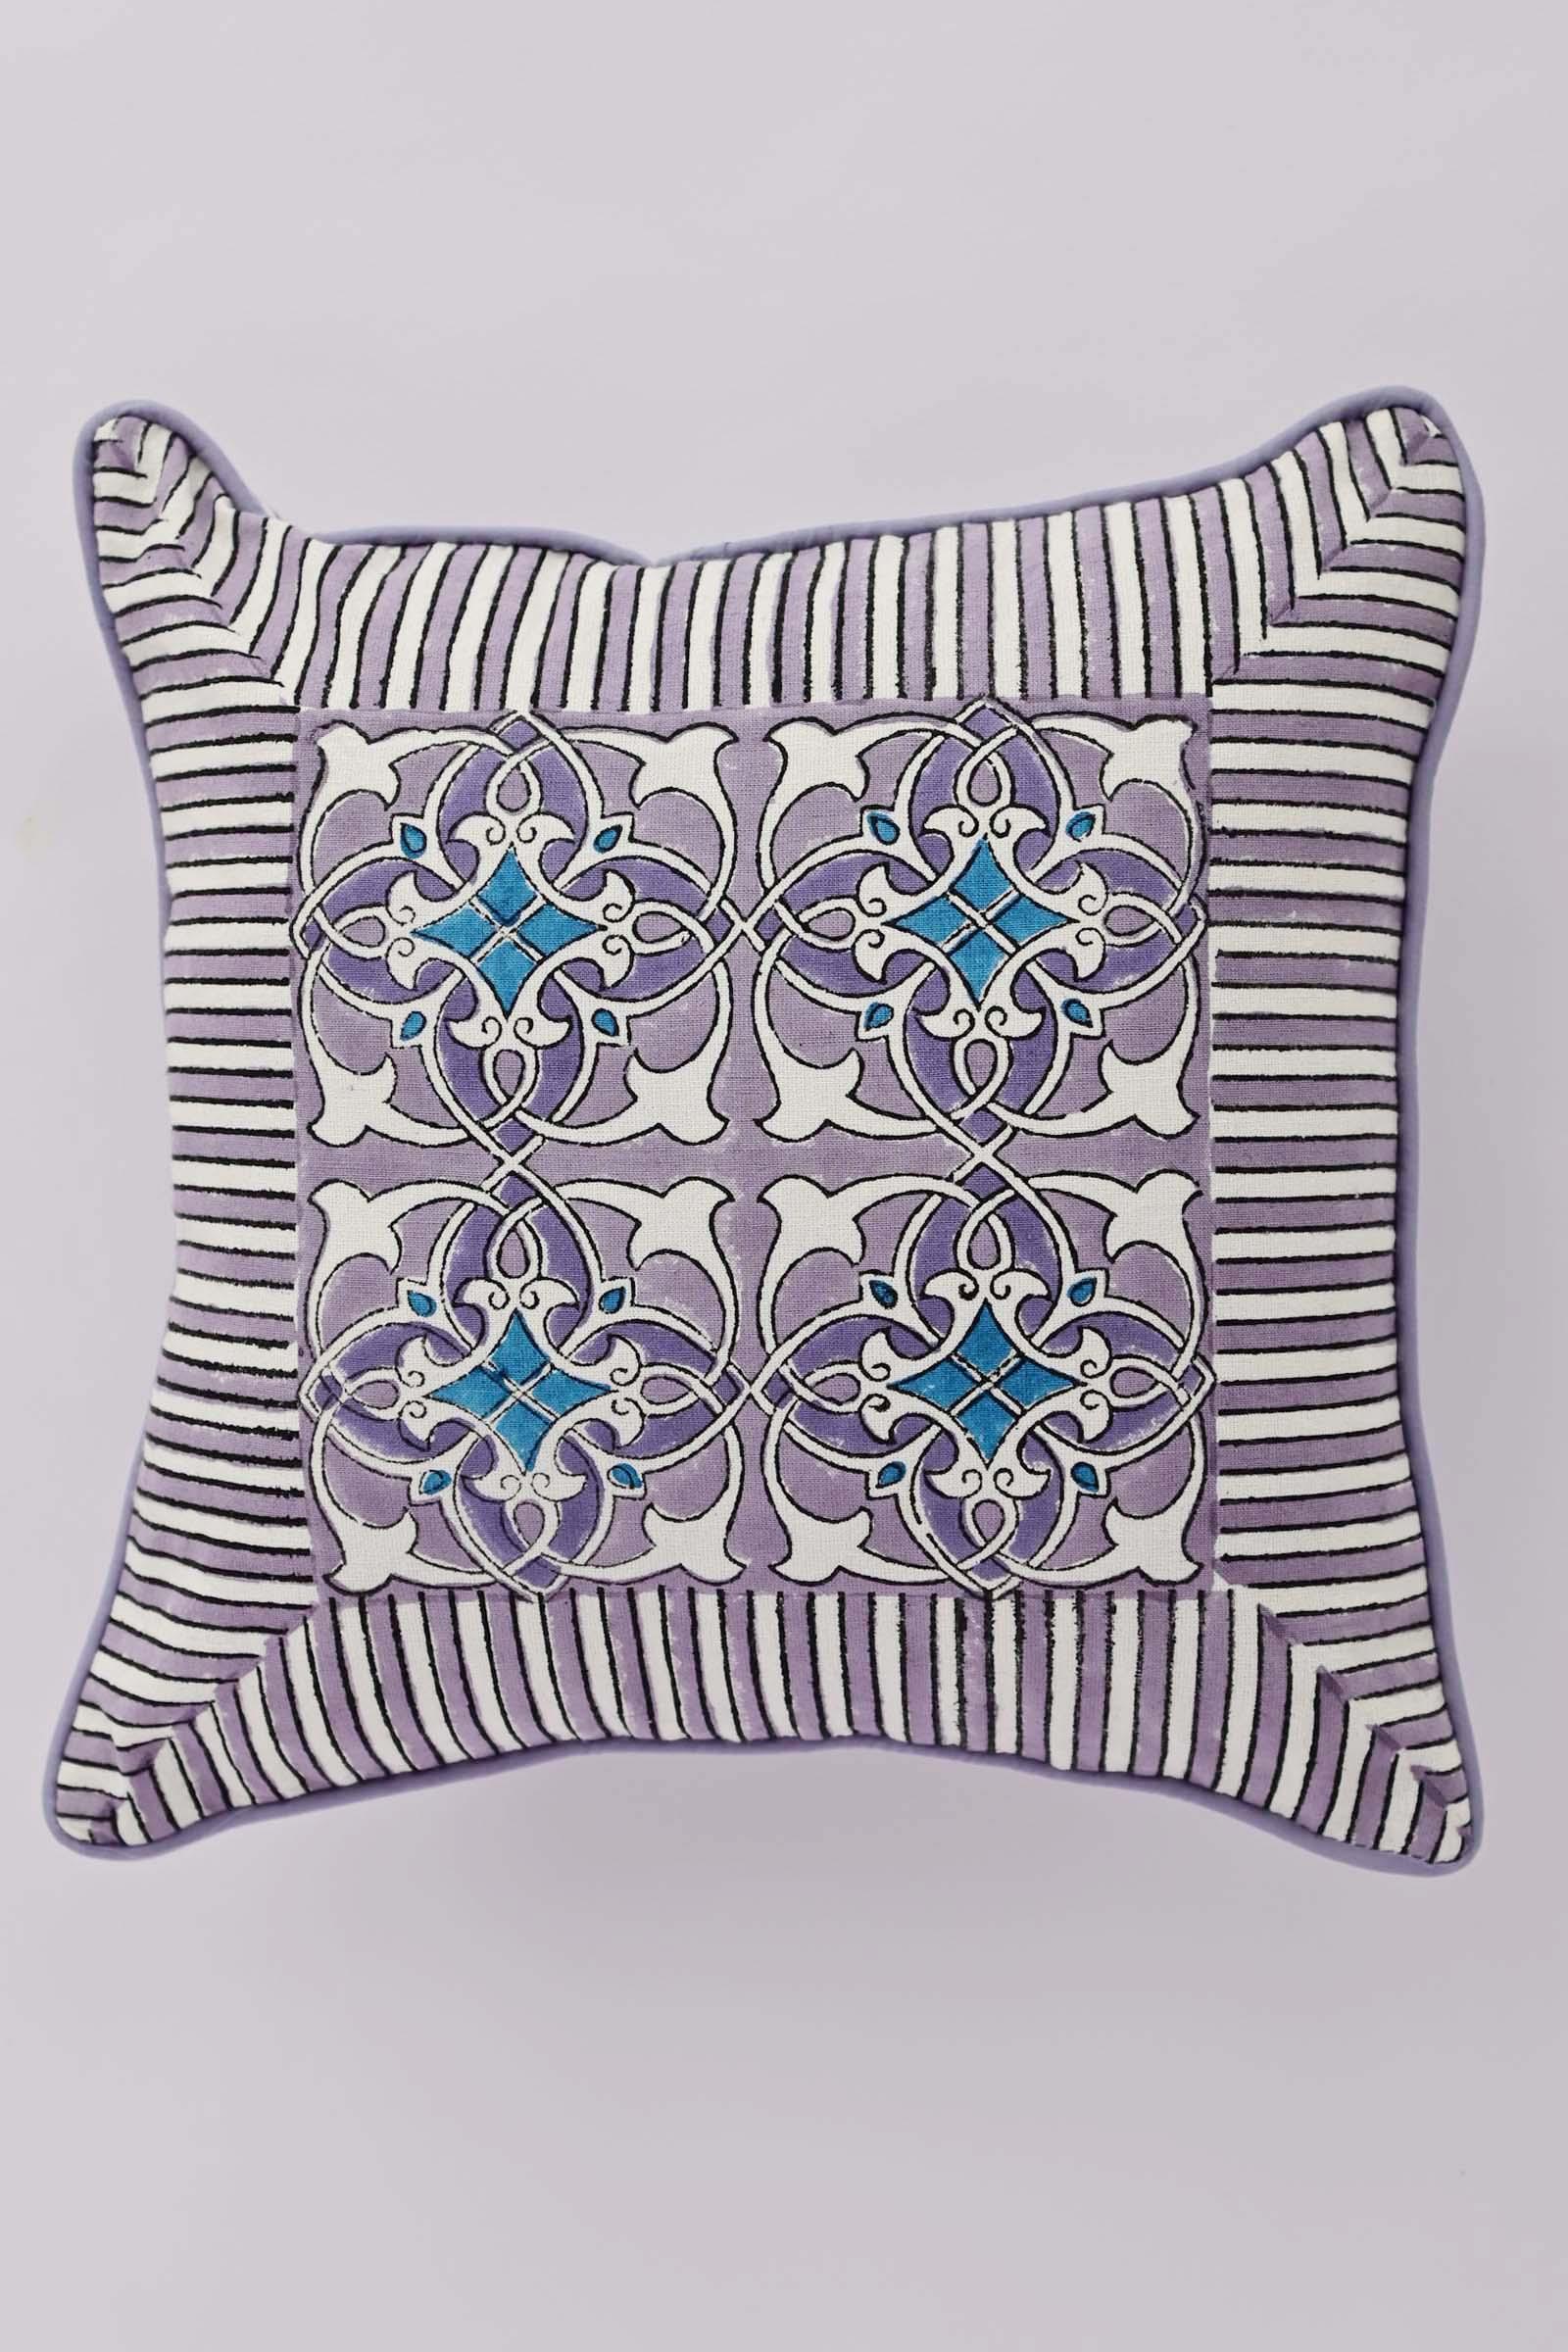 Artistic Lavender 12*12 Cushion Cover